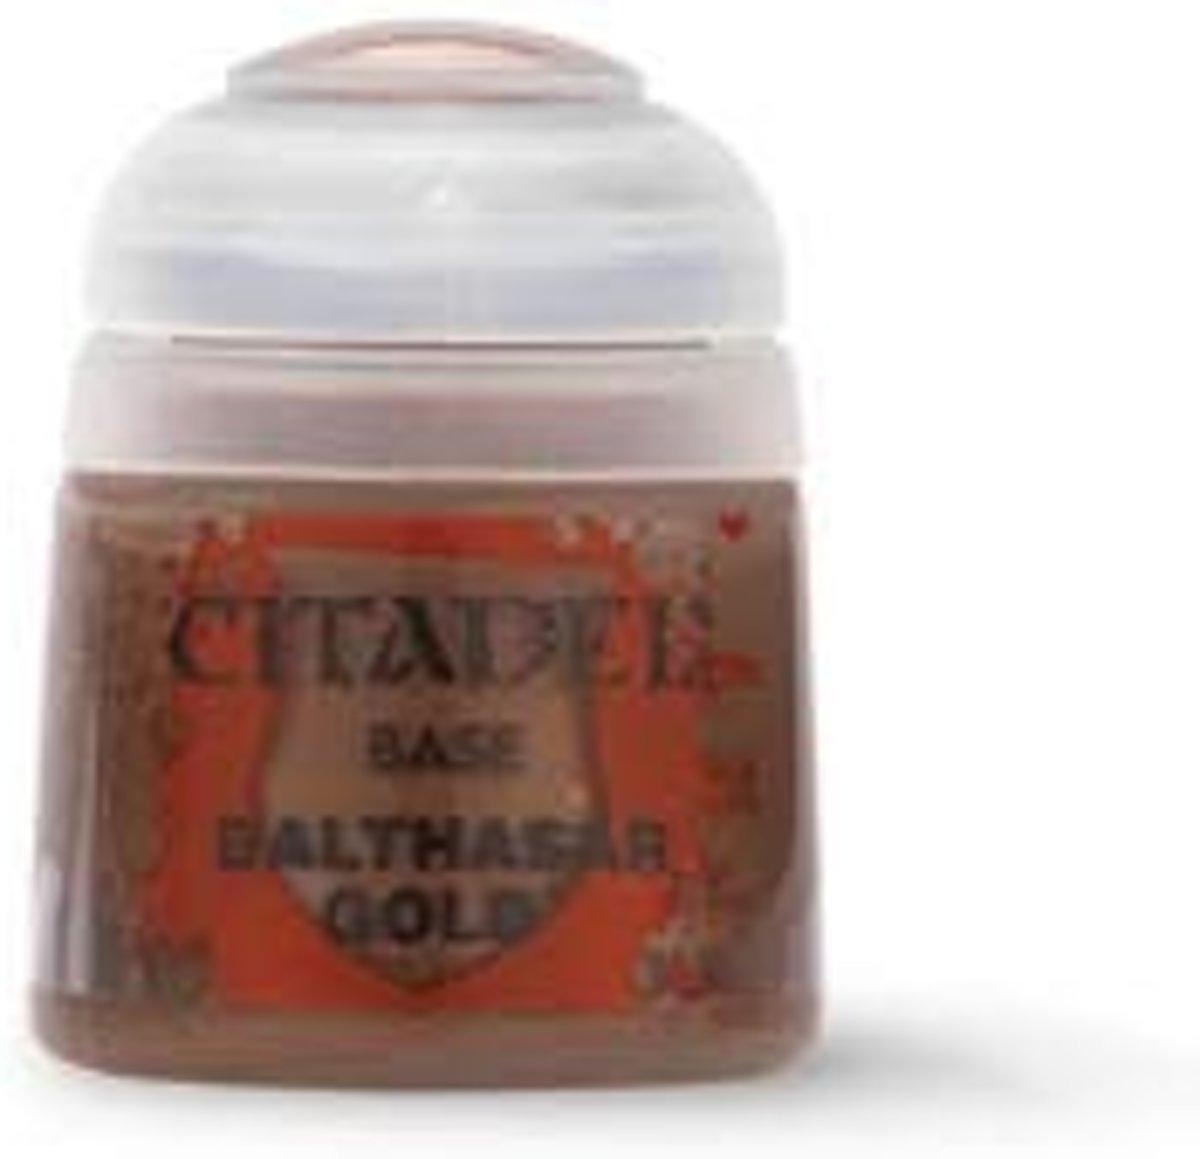 Citadel Base: Balthasar Gold kopen